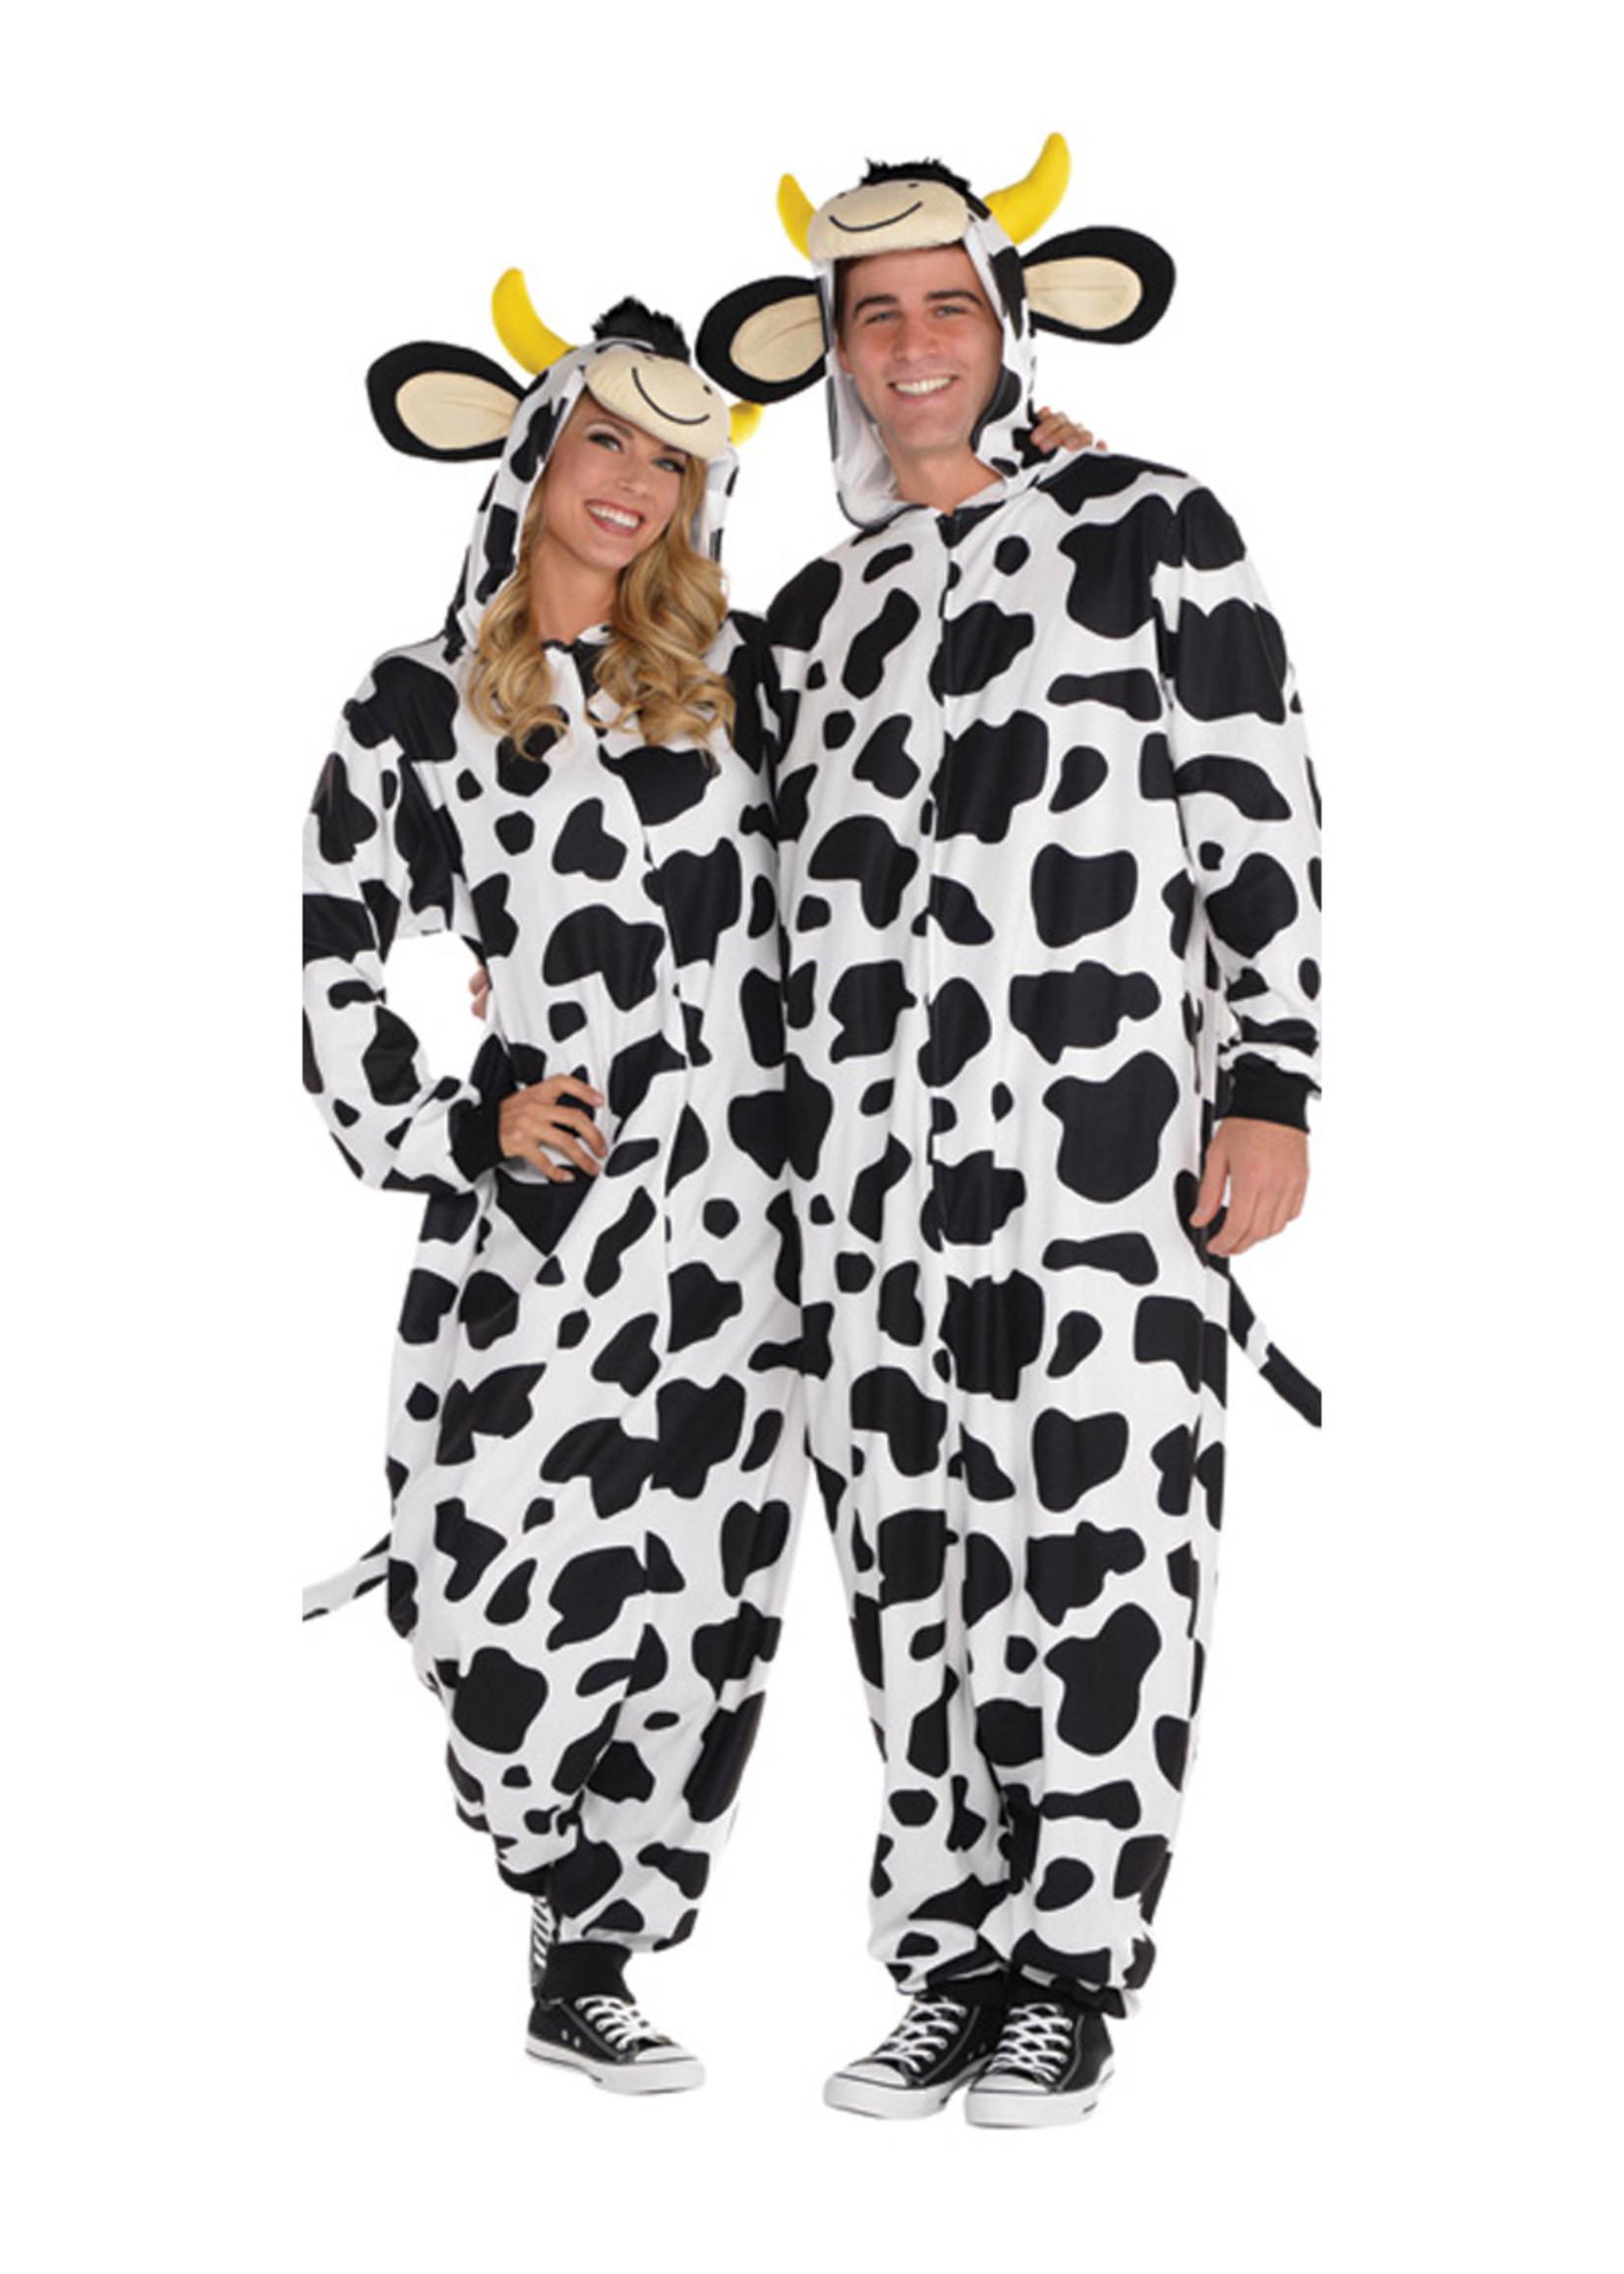 Cow Zipster Costume - Humor